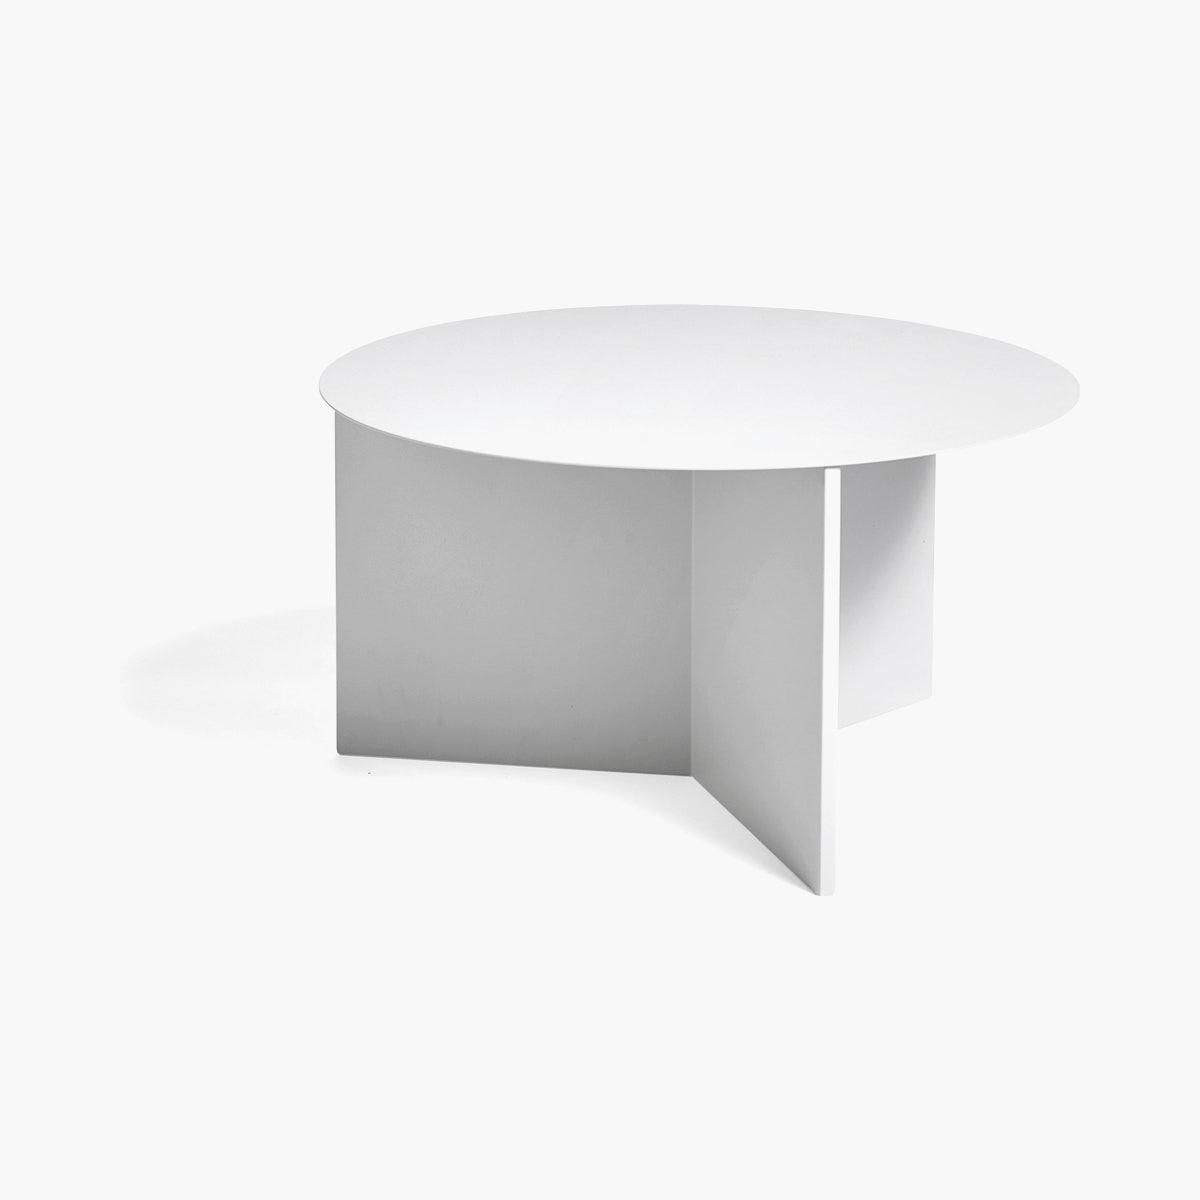 Slit Table, XL Coffee Table